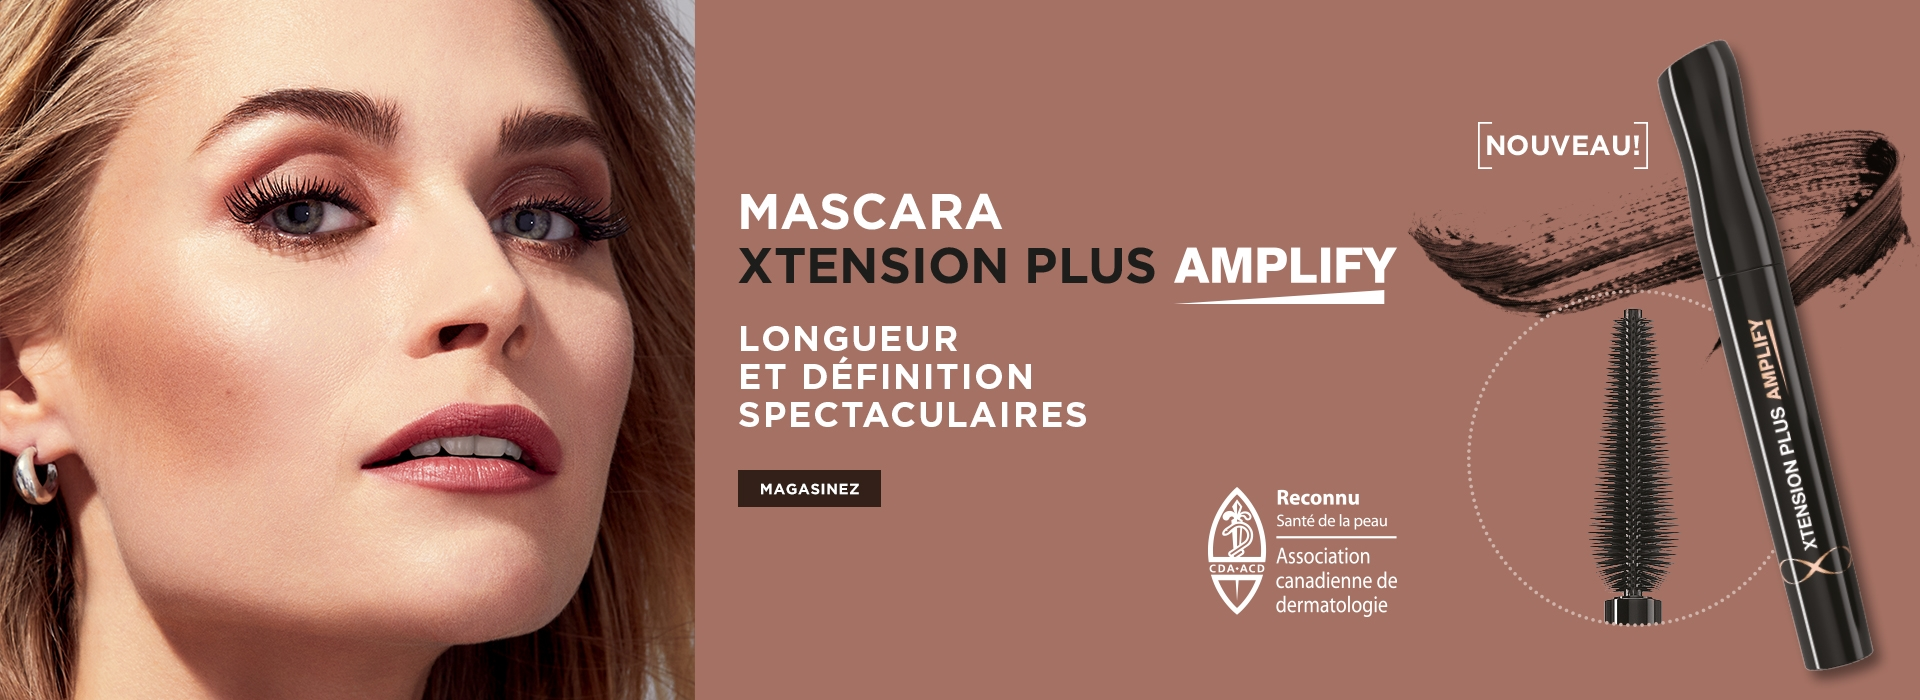 Mascara xtension plus amplify